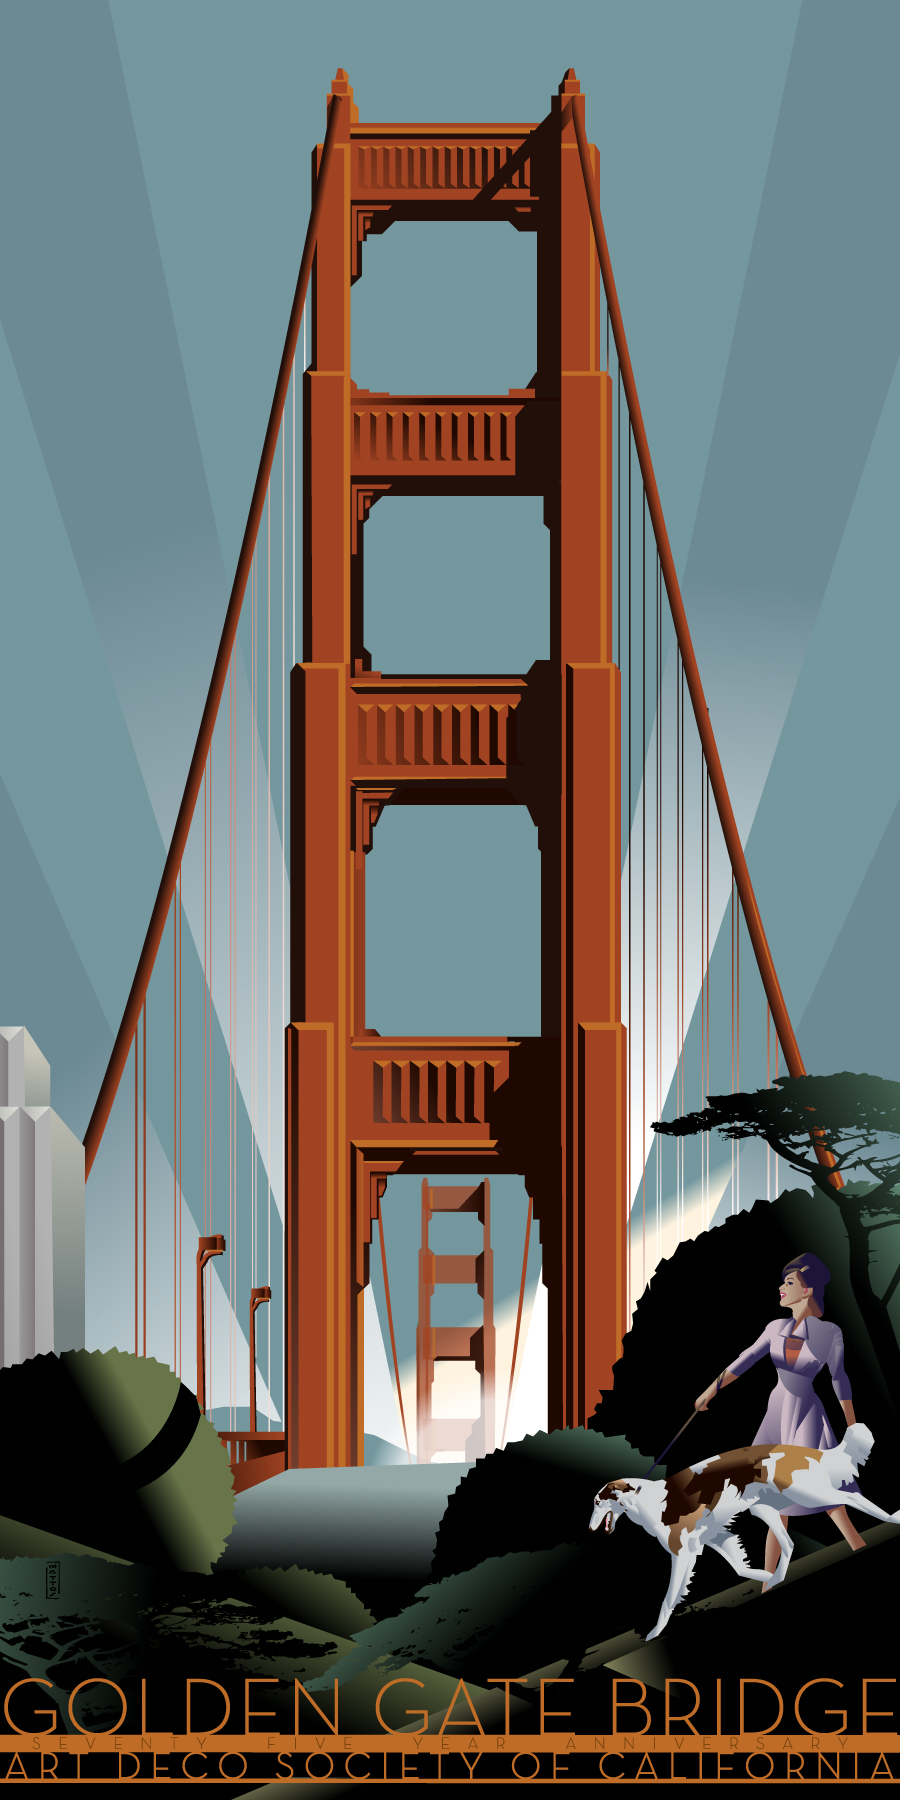 Art Deco Society of California Golden Gate Bridge Poster ...